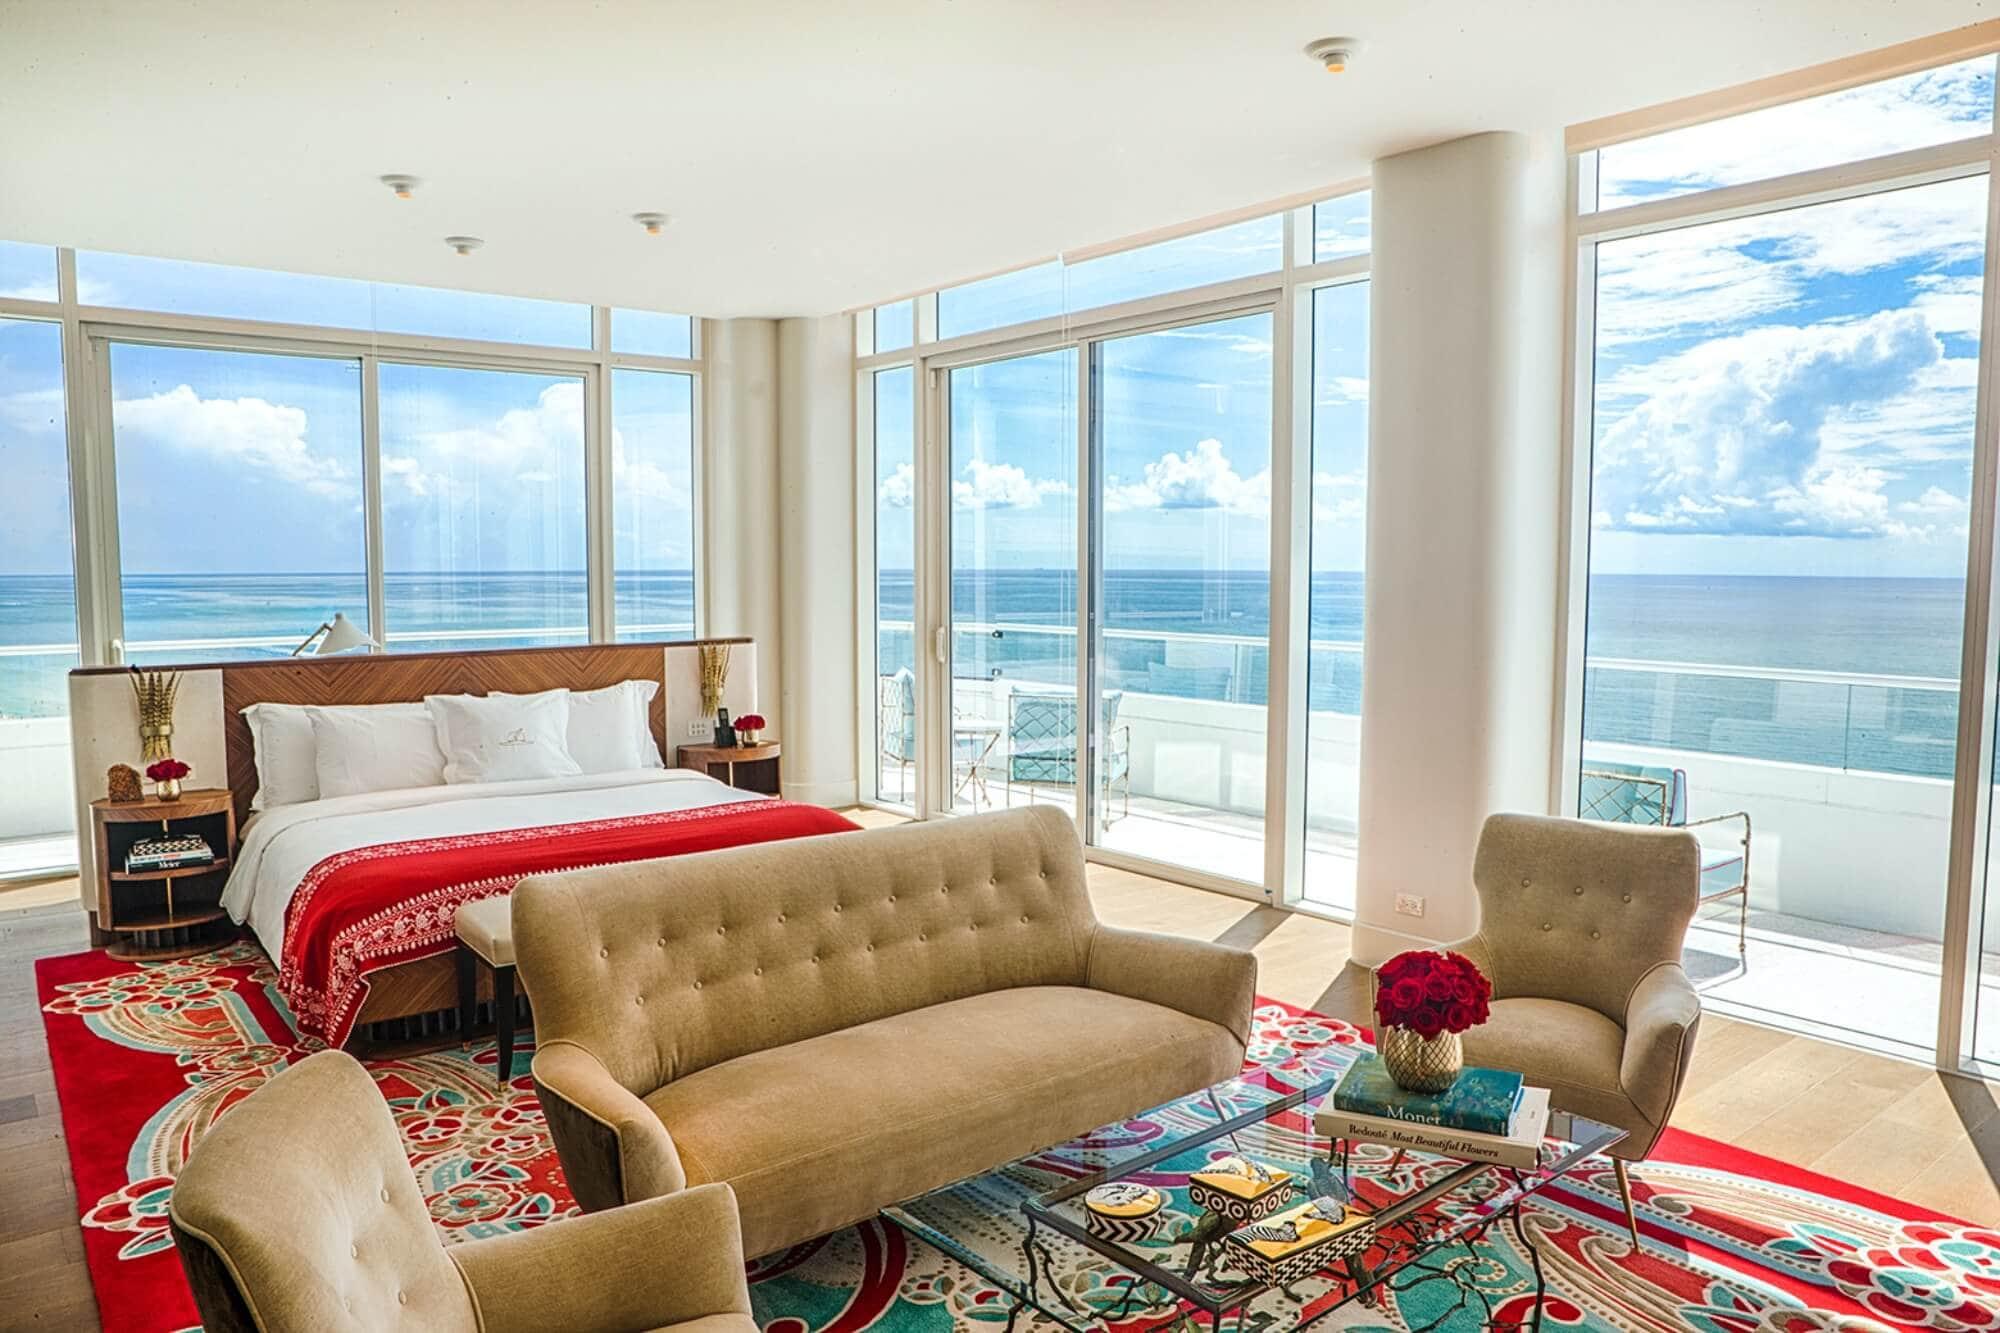 Penthouse Suite at Faena Hotel Miami Beach